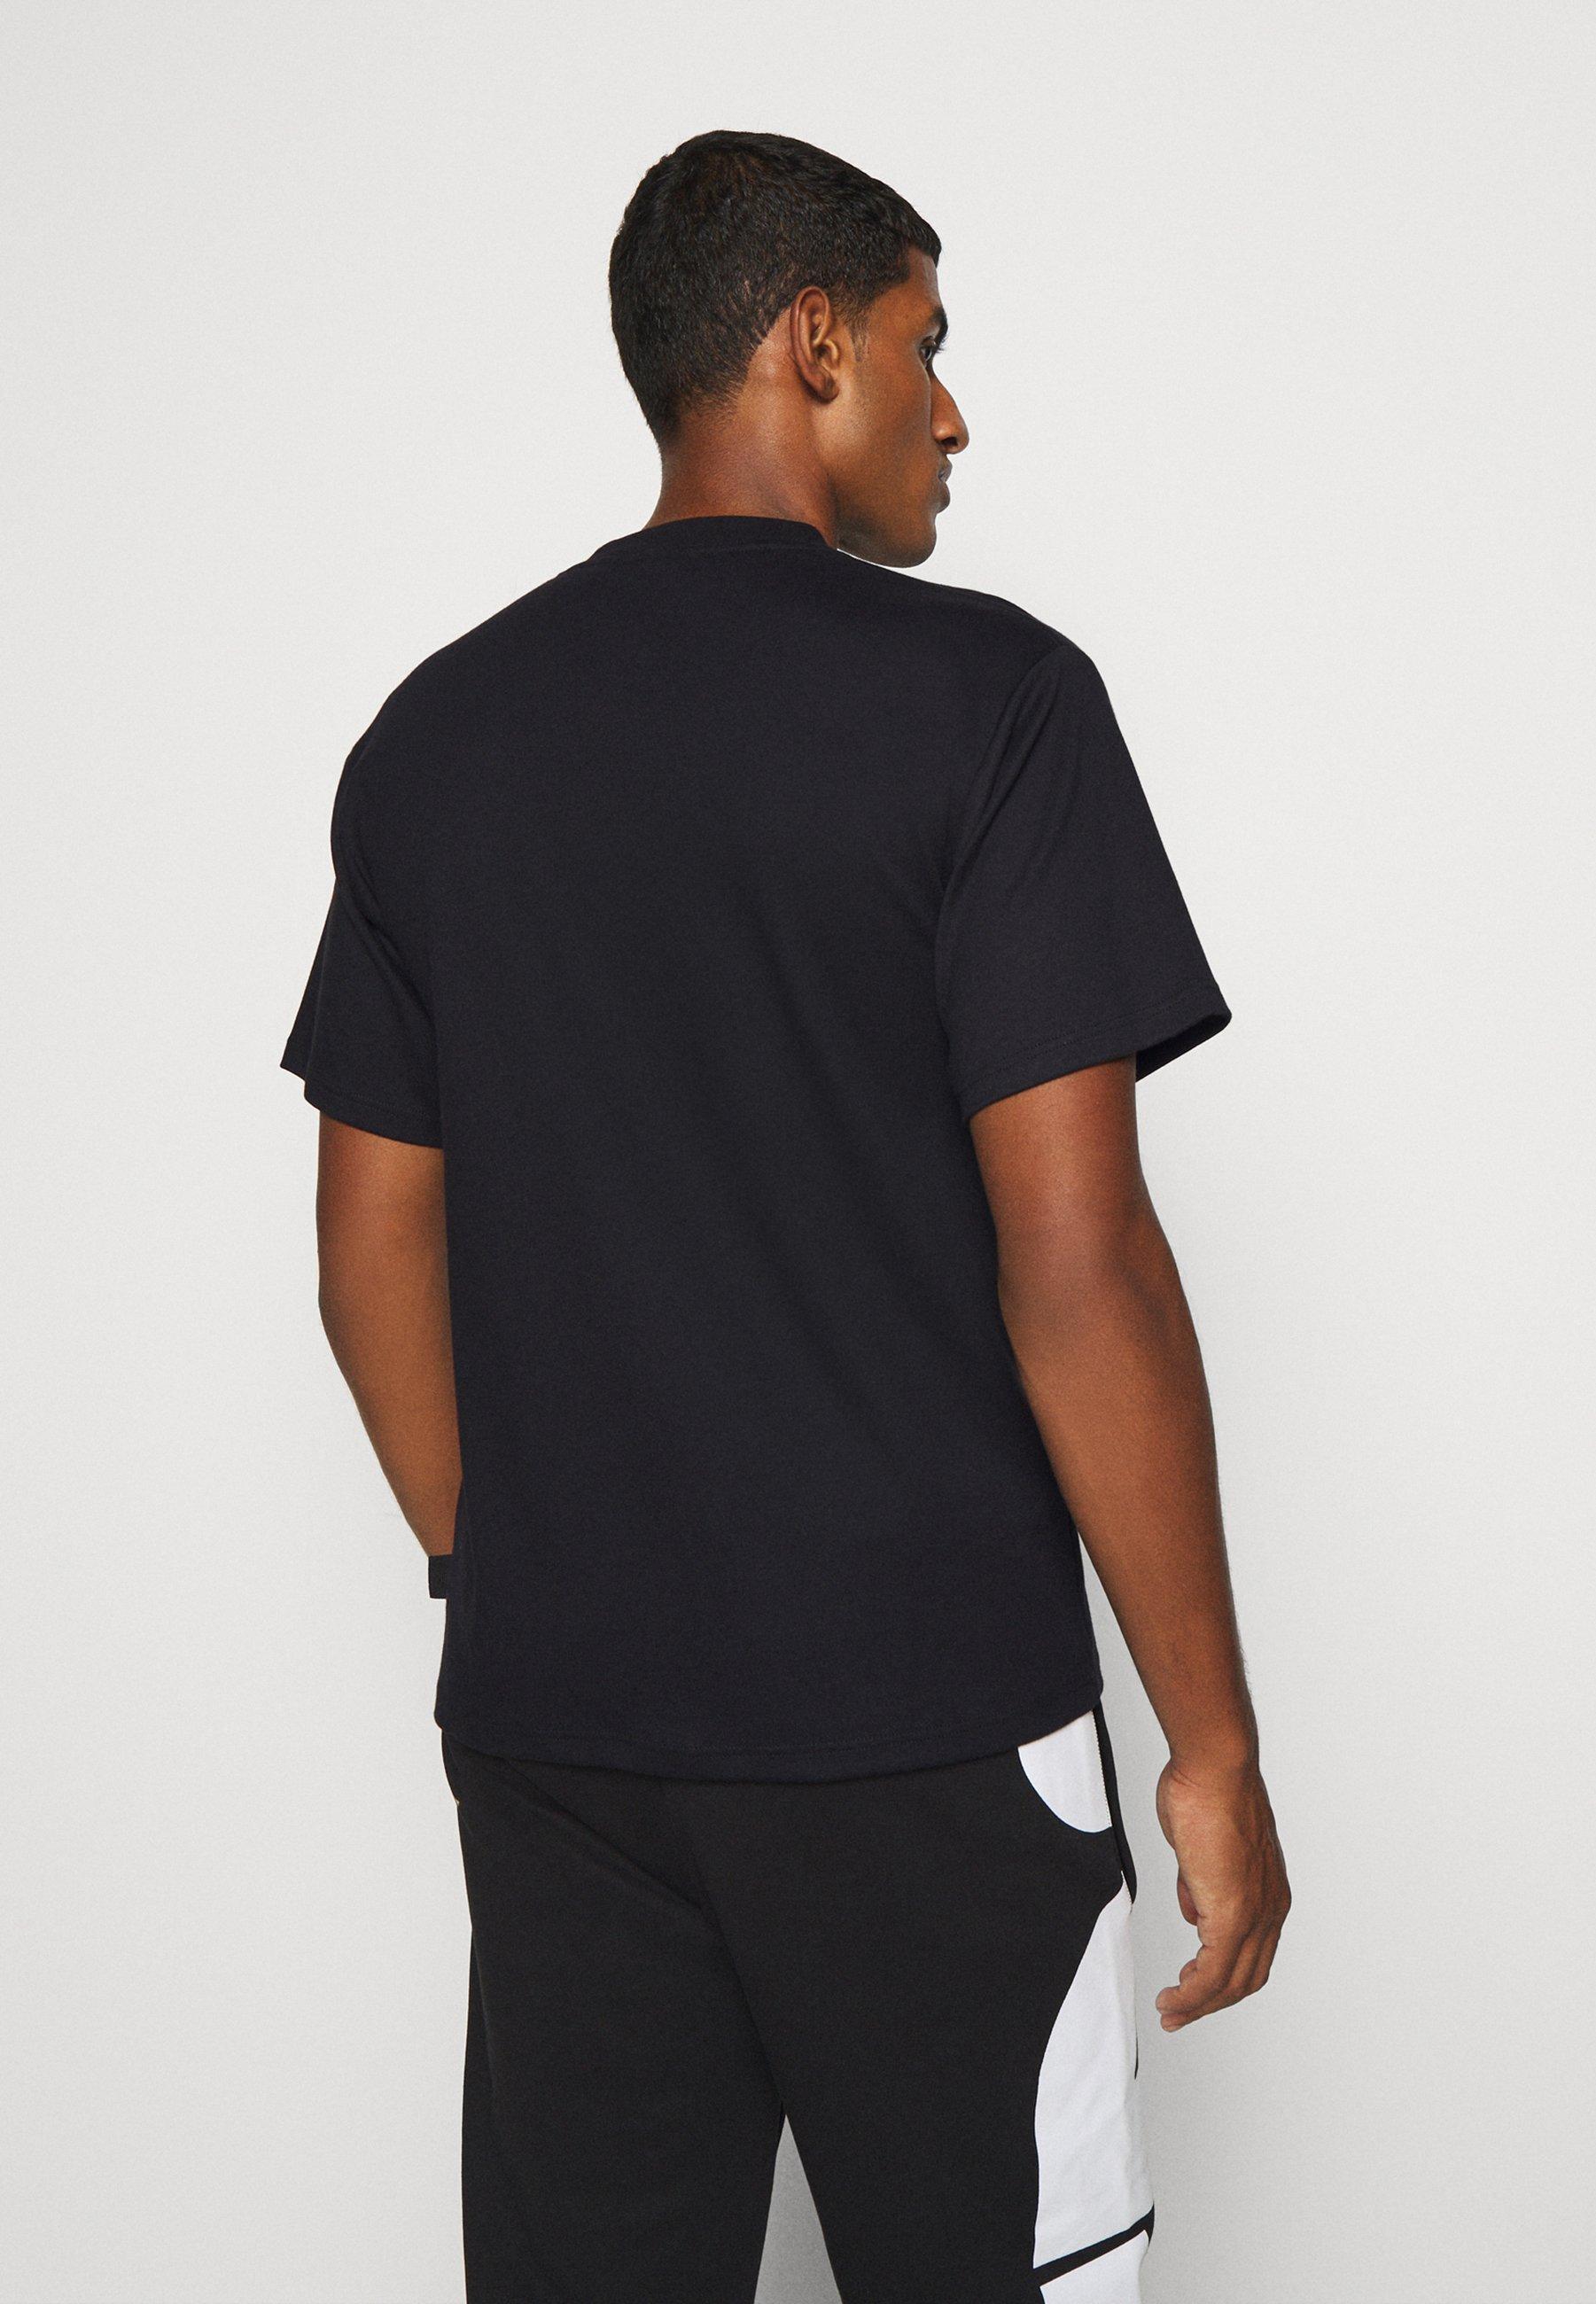 Nuevo estilo de moda de GCDS BASIC TEE Camiseta básica black l3yXl